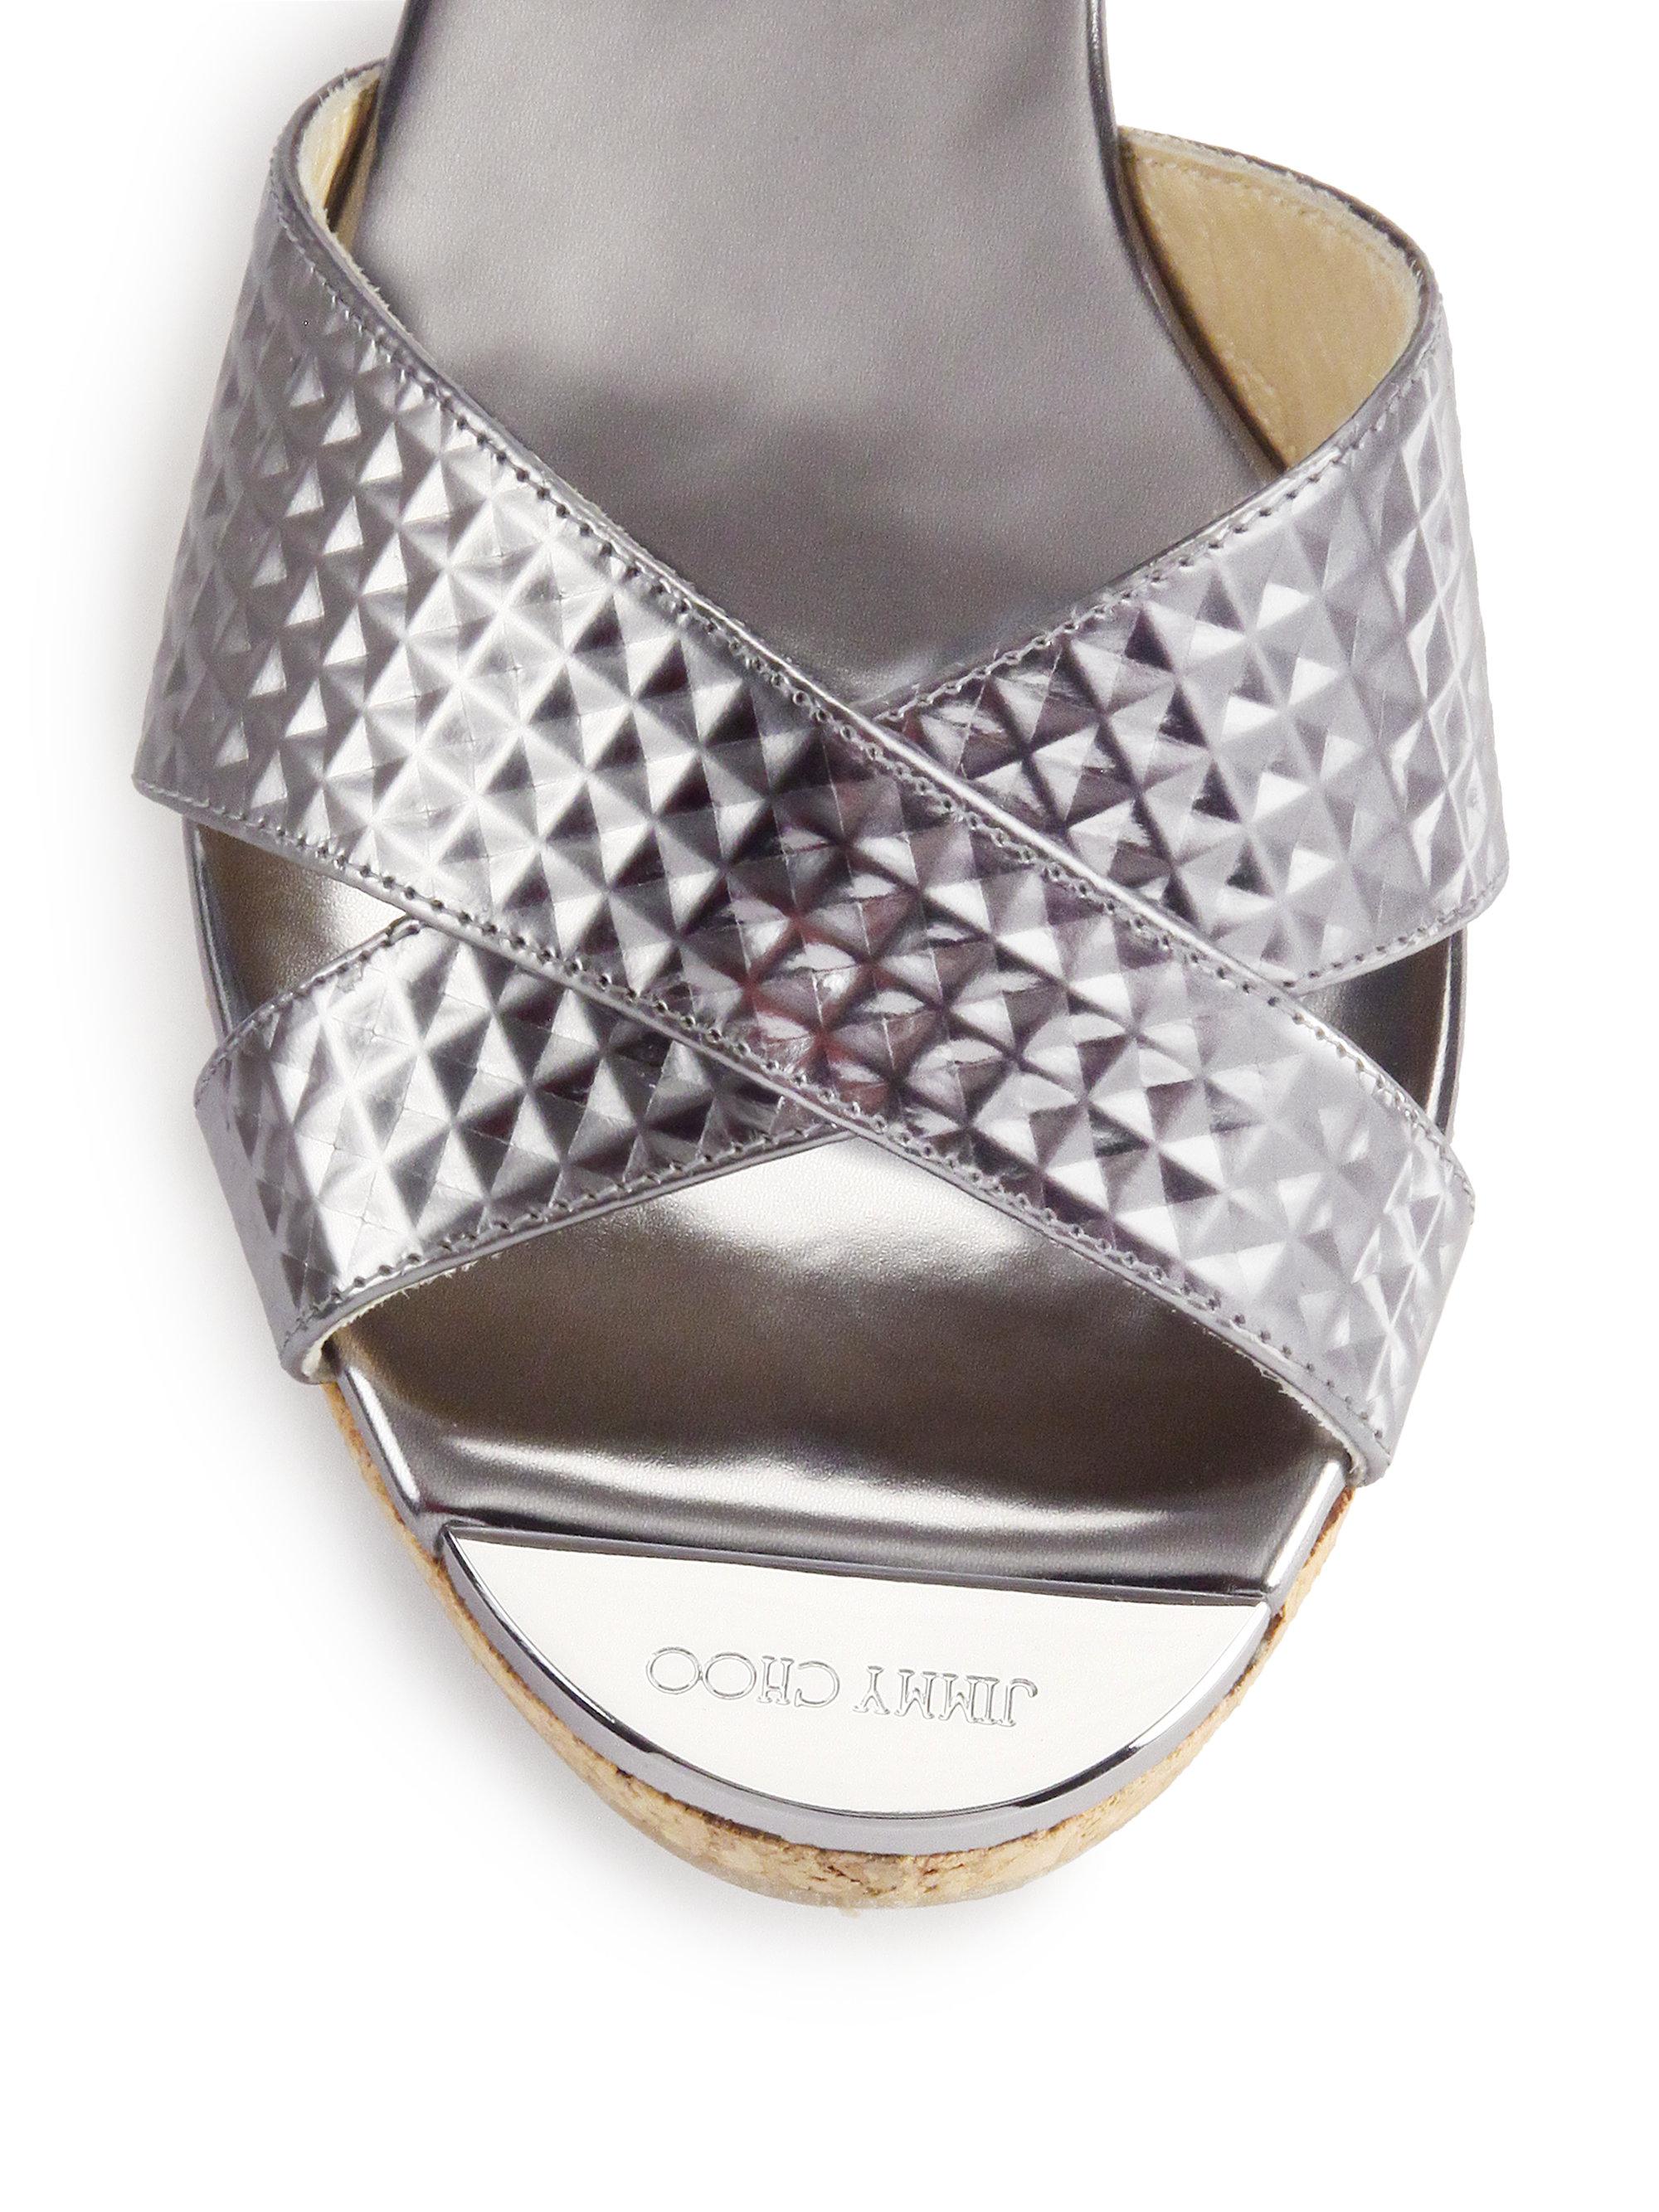 Jimmy Choo Panna Textured Metallic Leather Amp Cork Sandals